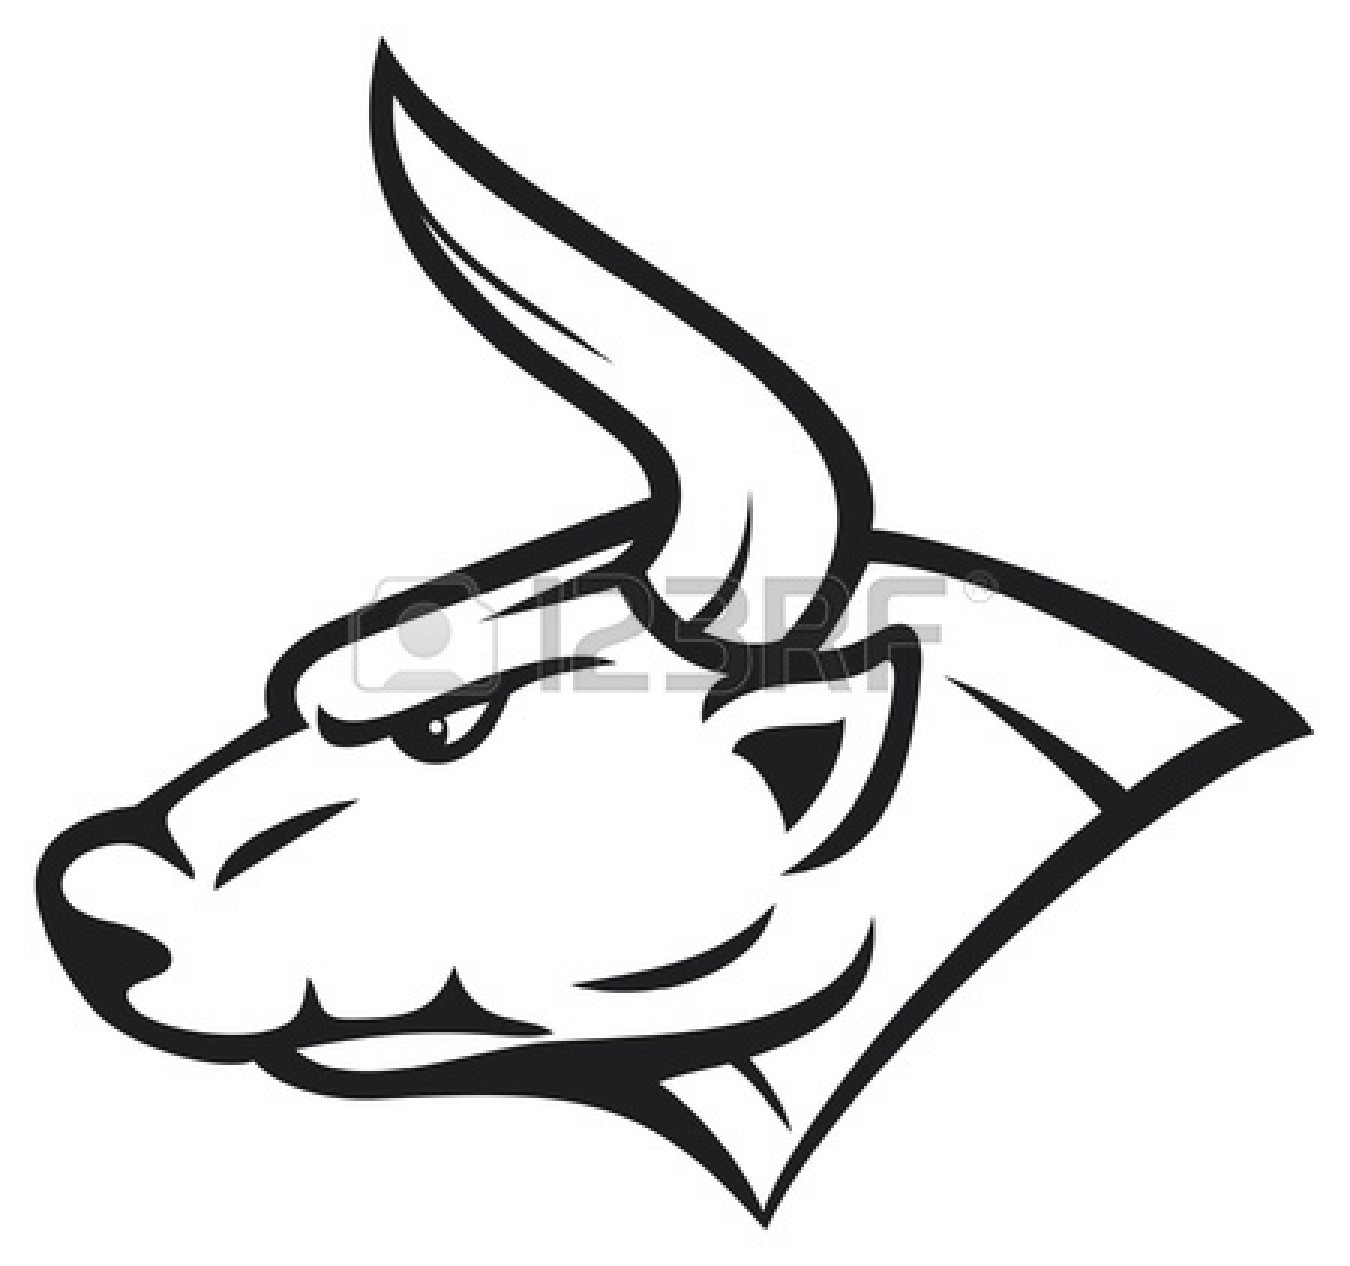 Bull clipart bull head. Steer free download best